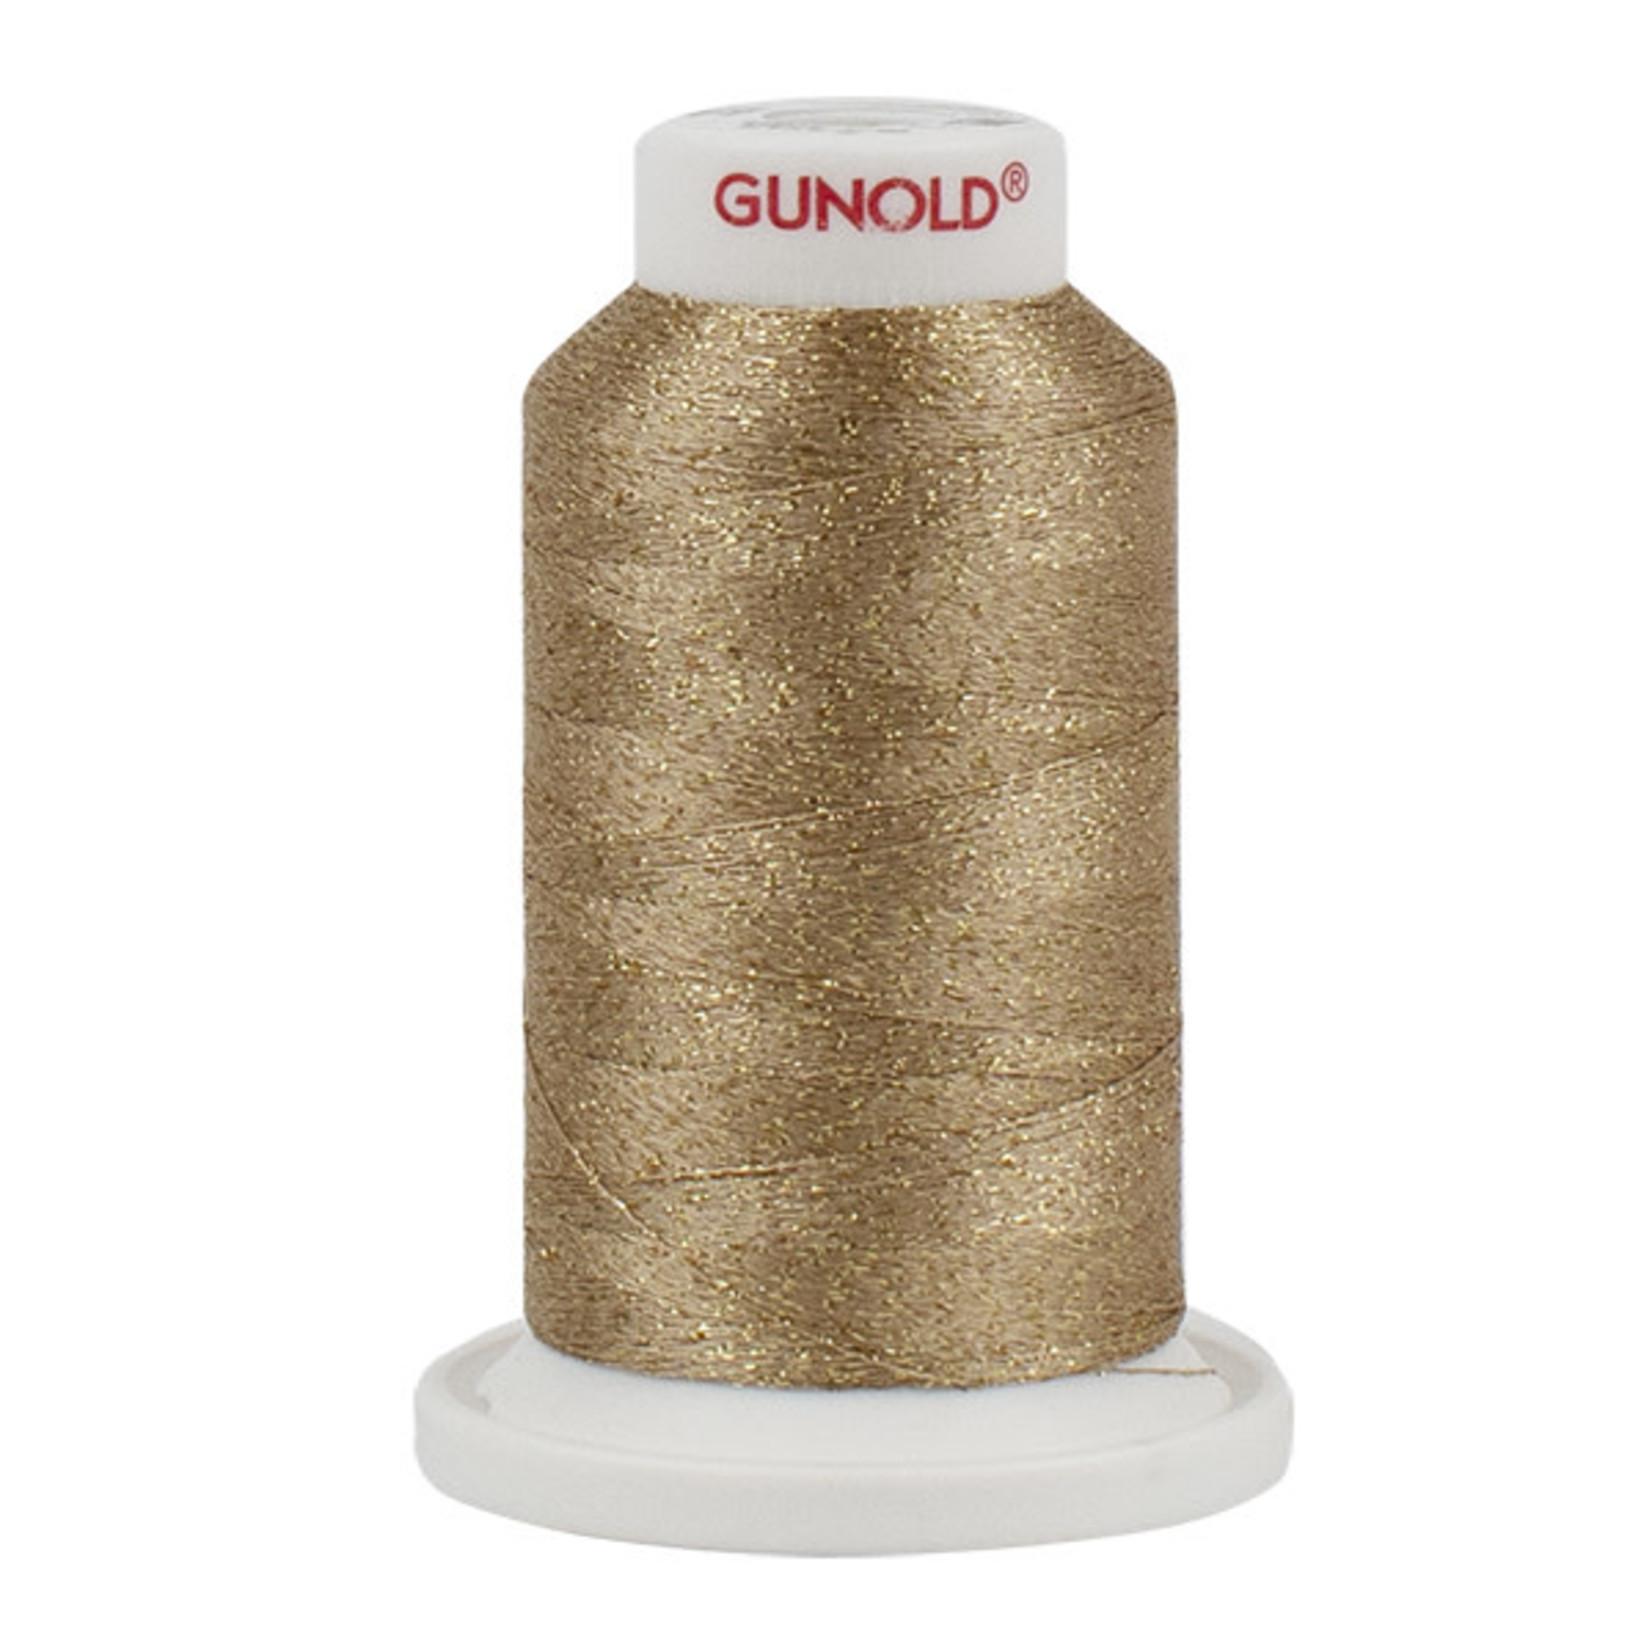 Gunold Poly Sparkle™ (Star™) Mini-King Cone 1,100 YD, 30 Wt, Dark Ecru with Gold Sparkle 50546